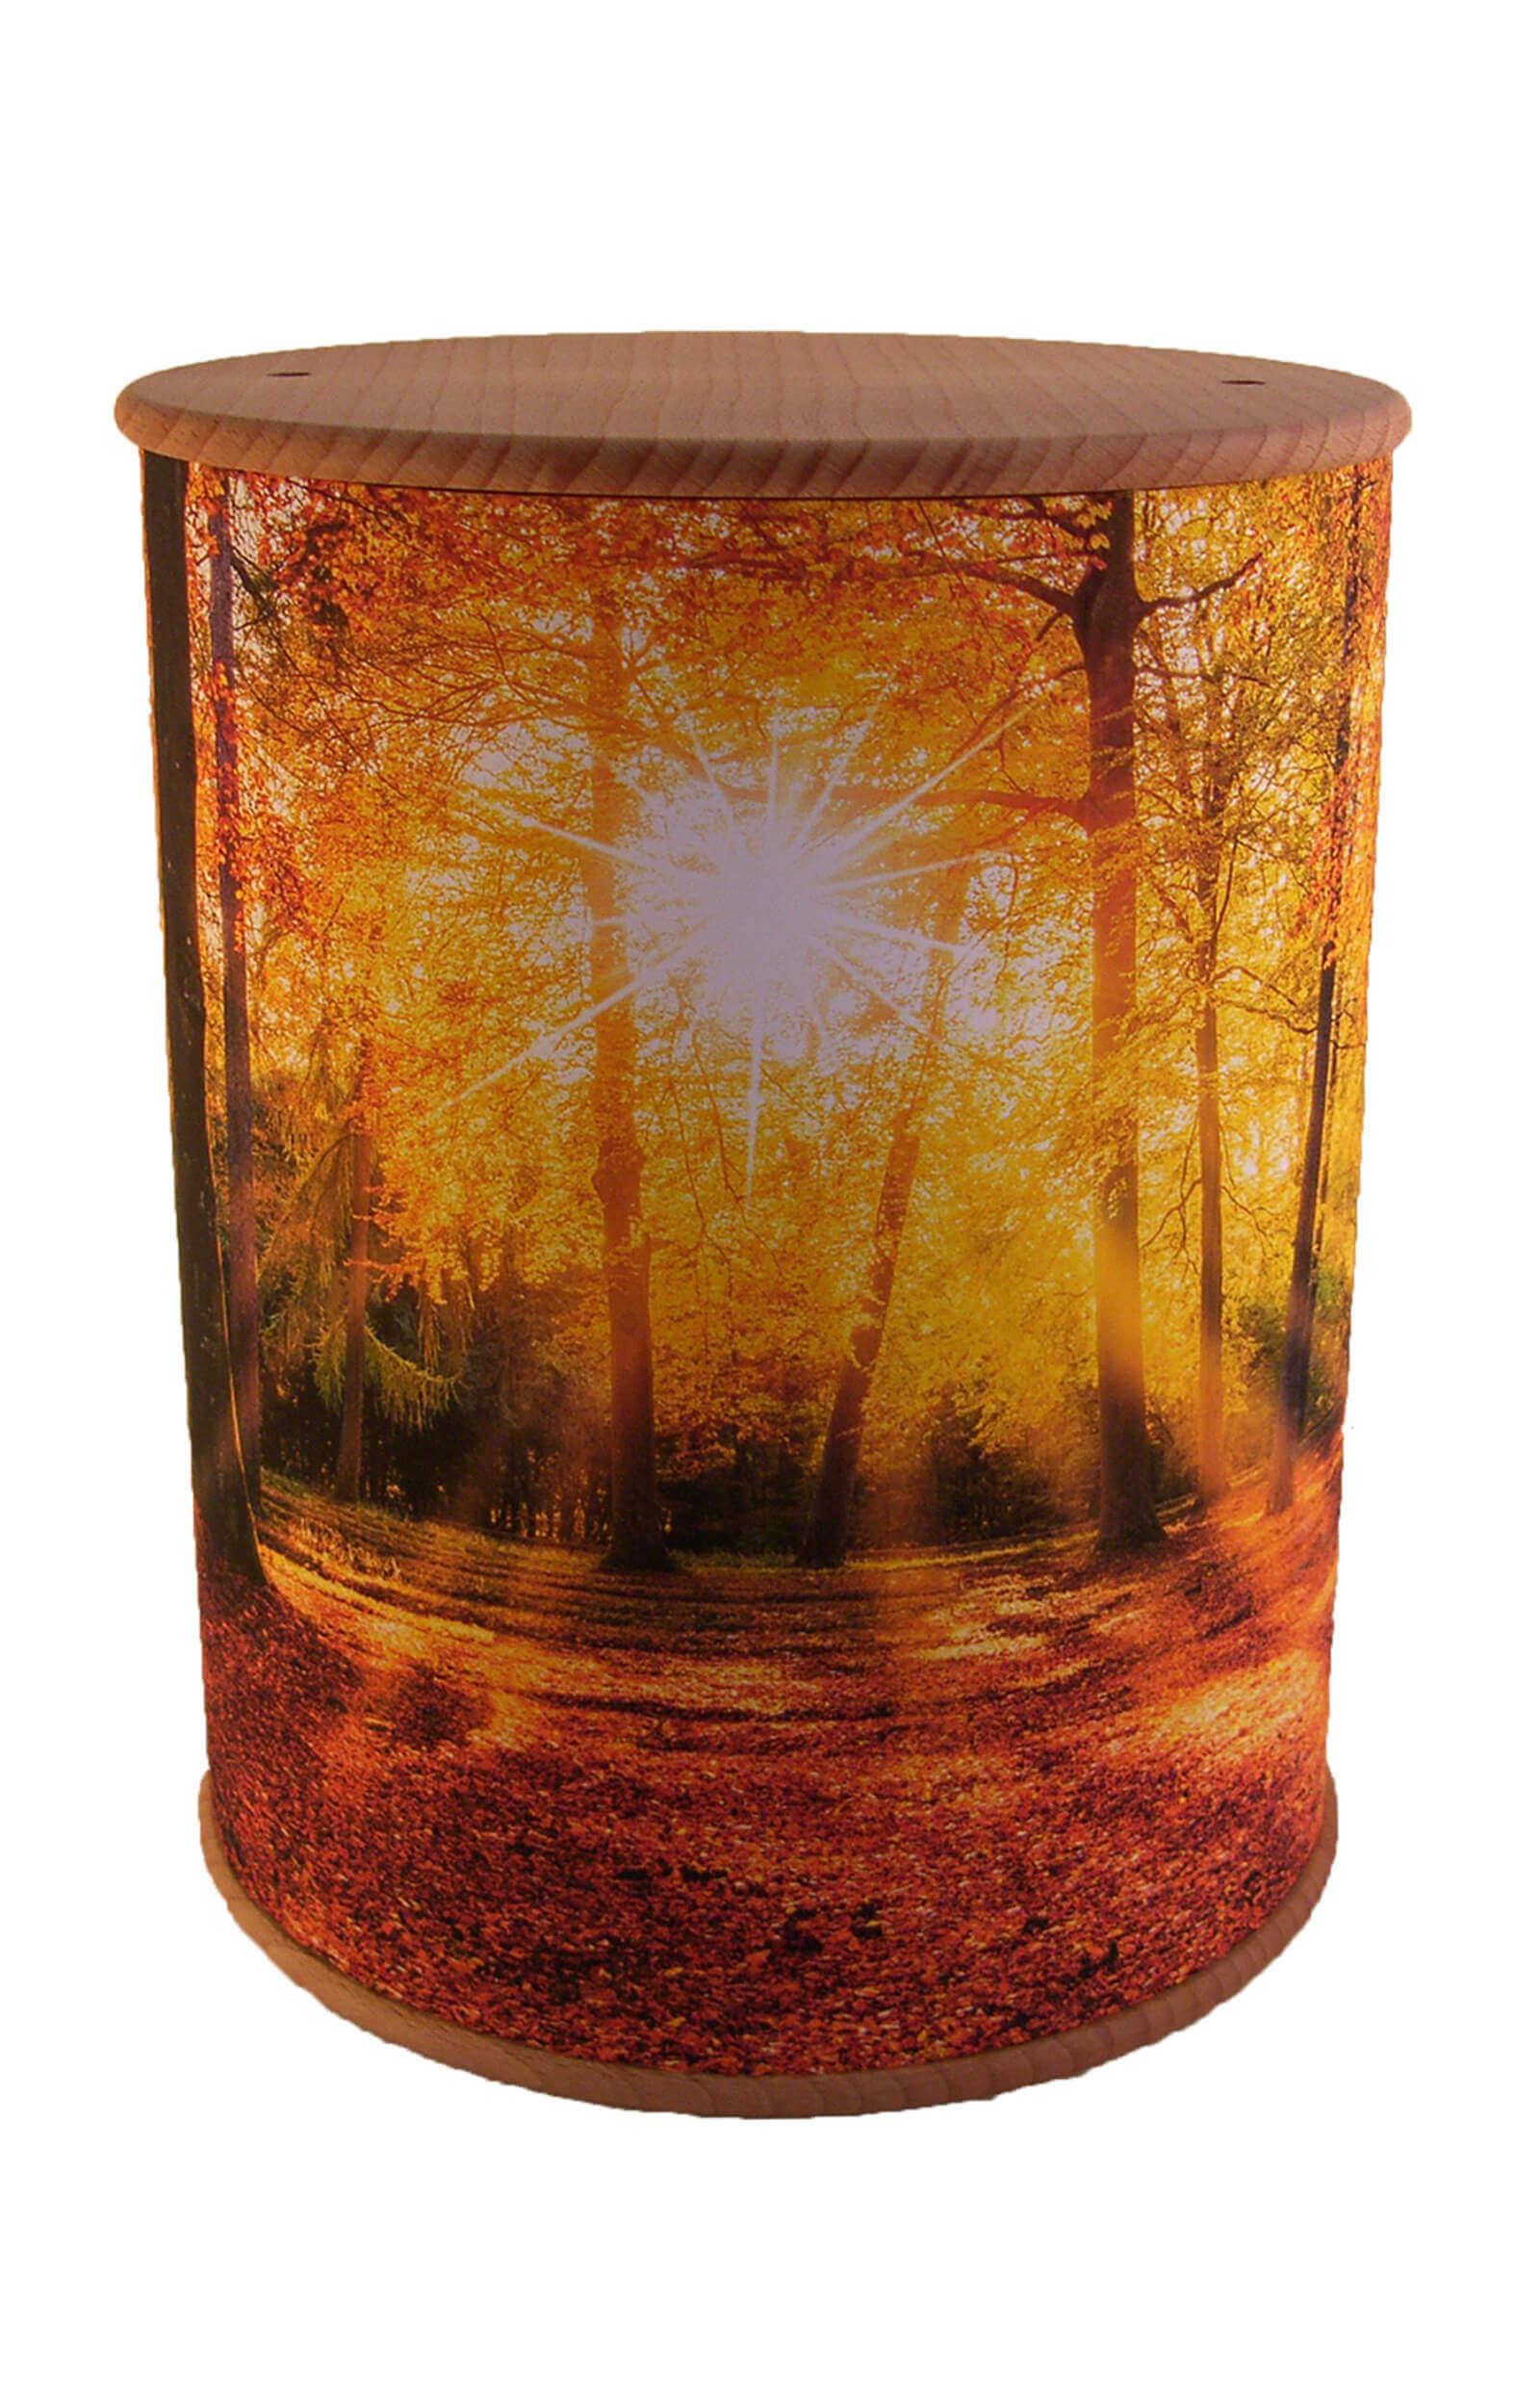 en ZB002 photo urn autumn forest funeral urns on sale